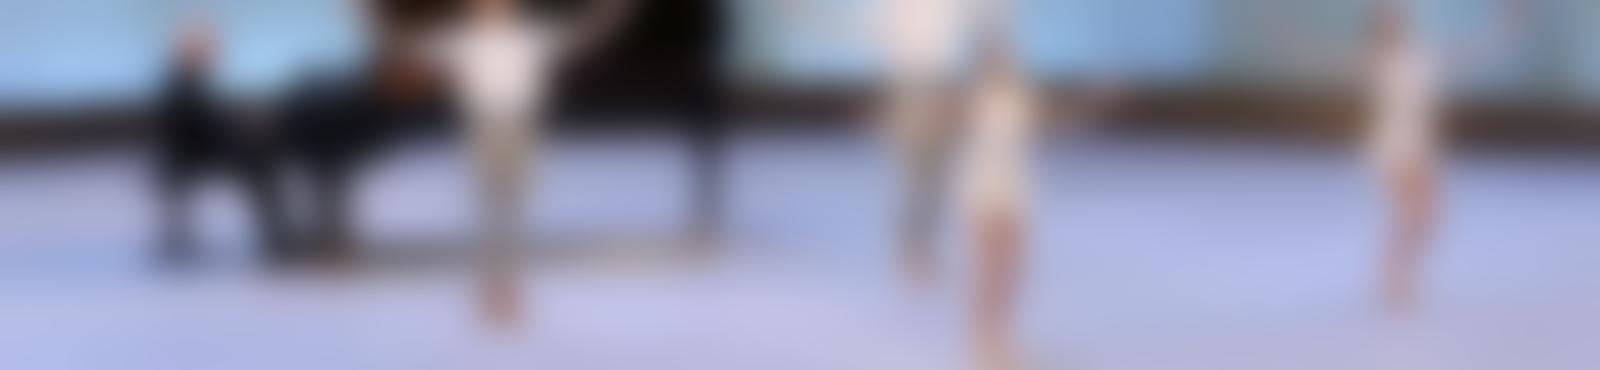 Blurred 518aa1aa 8a15 4c65 986d dada17621155